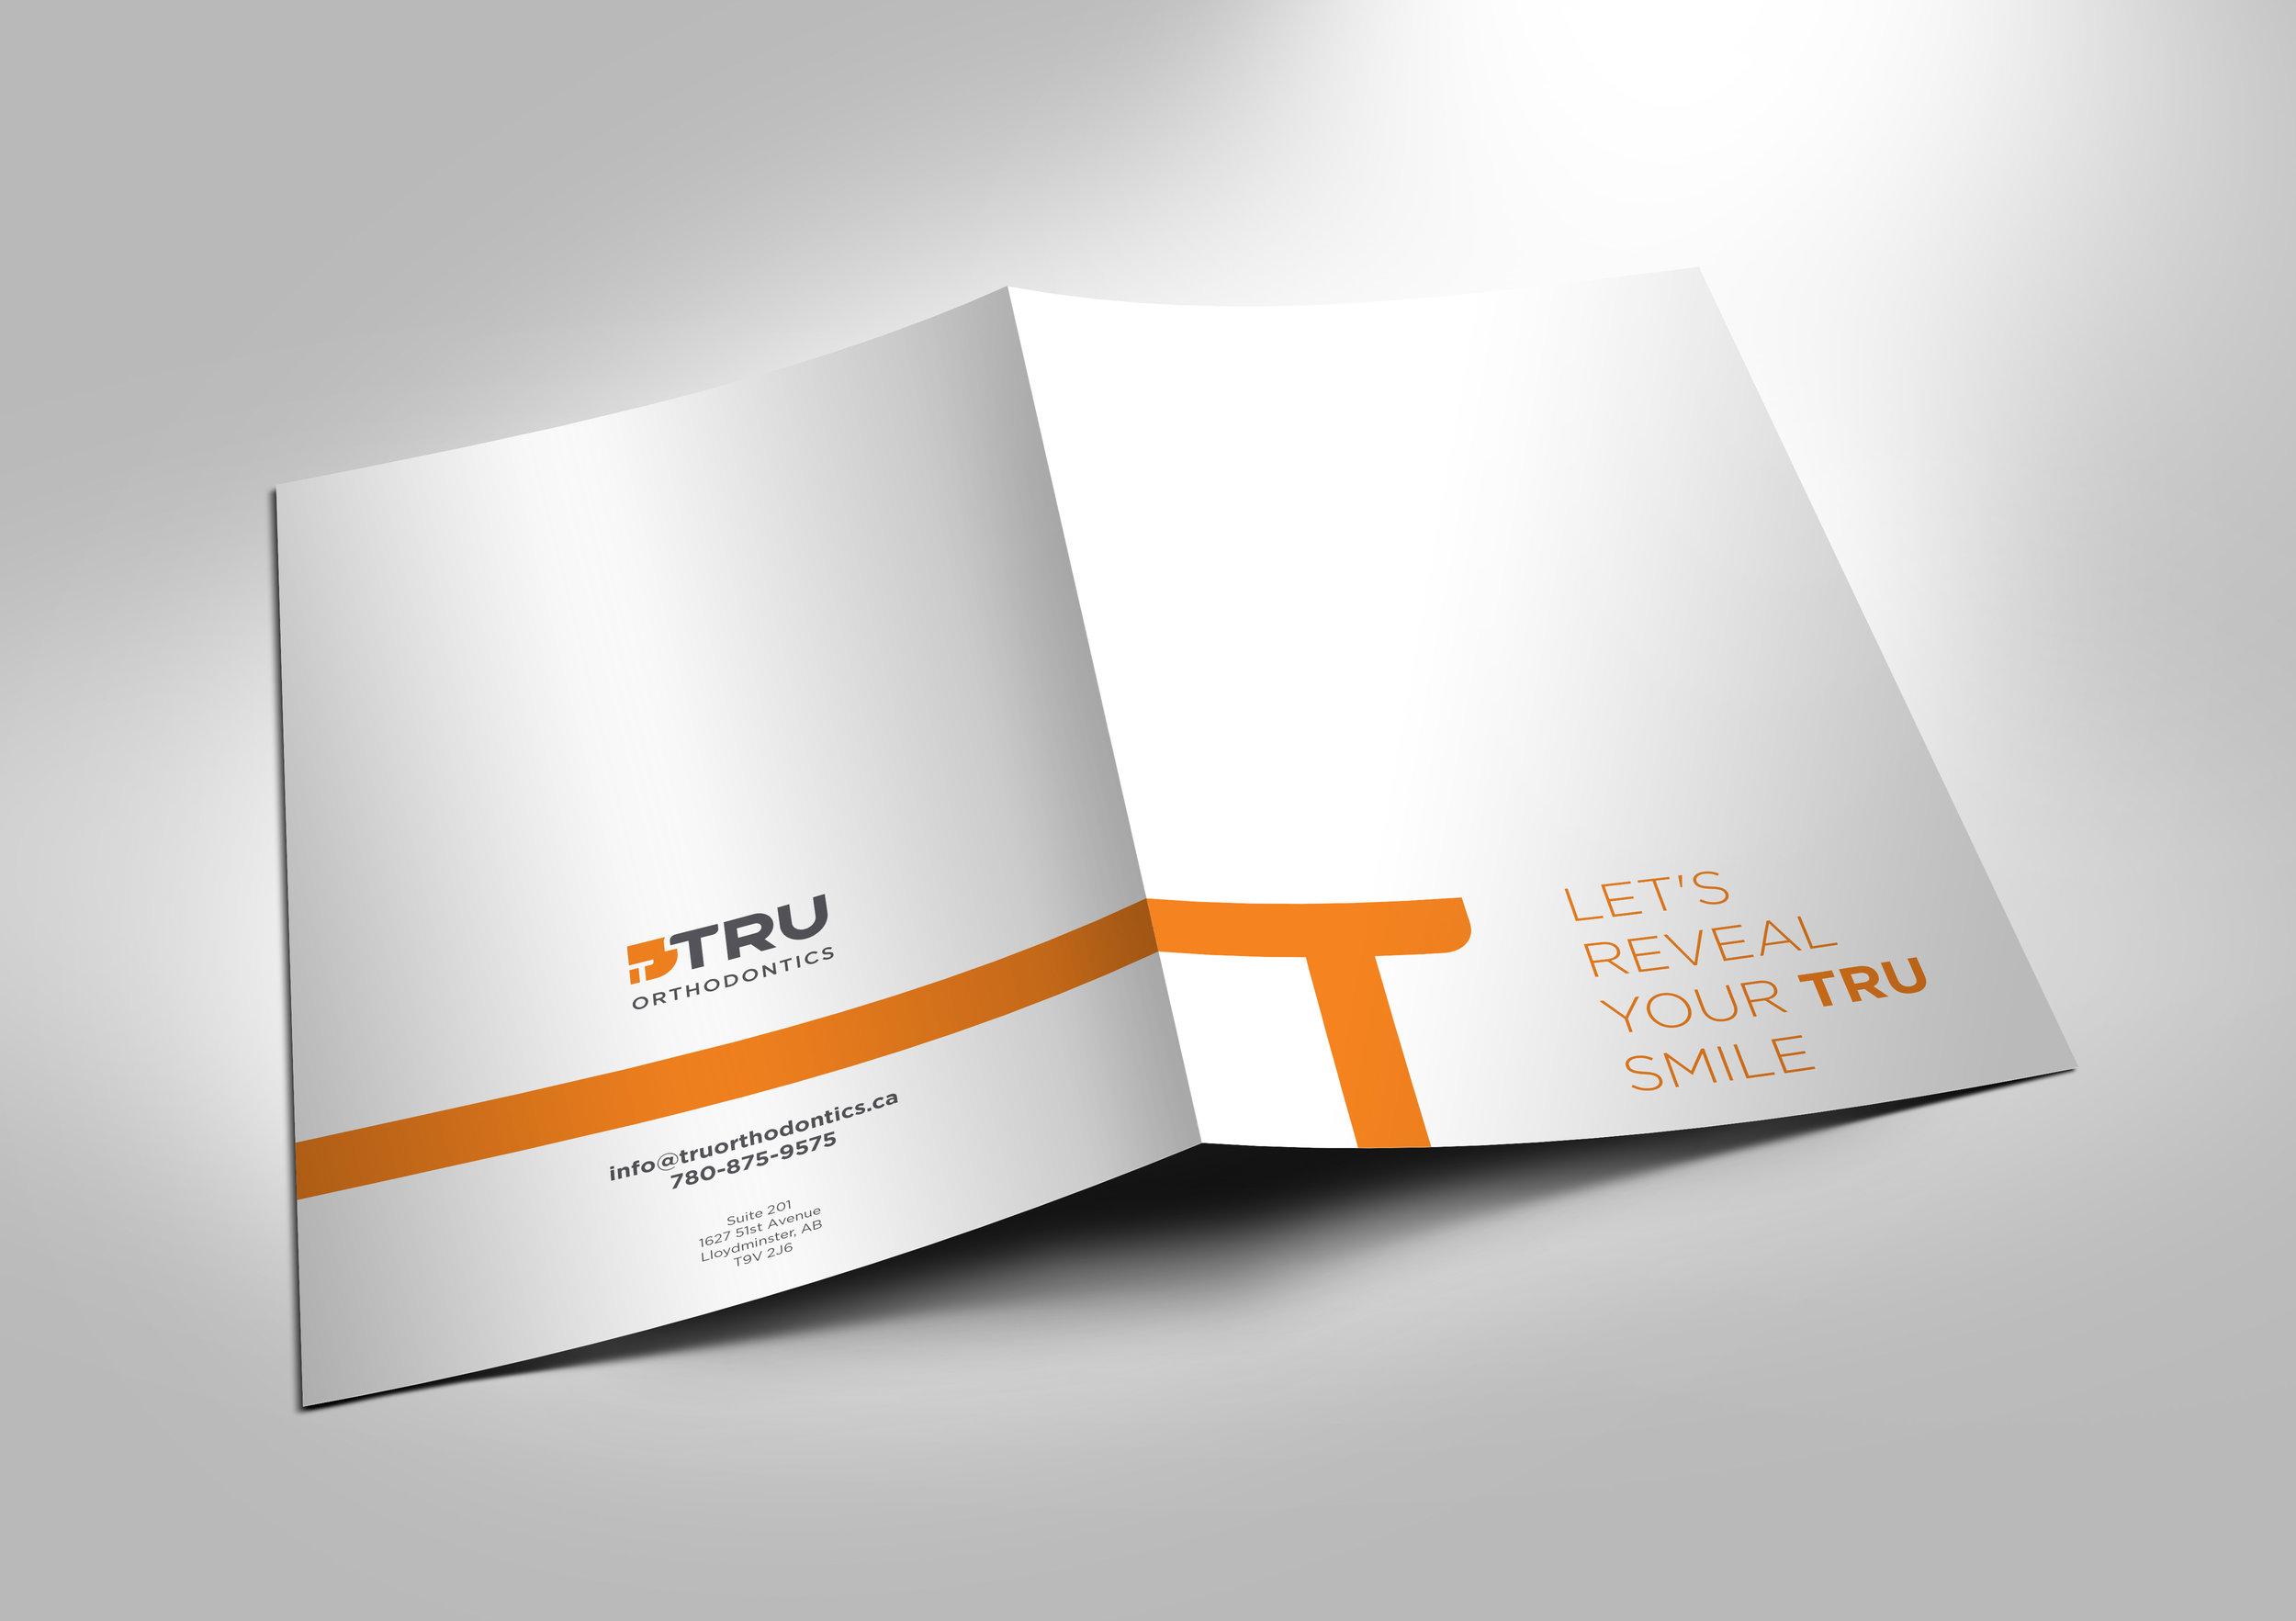 Tru orthodontics business card design back